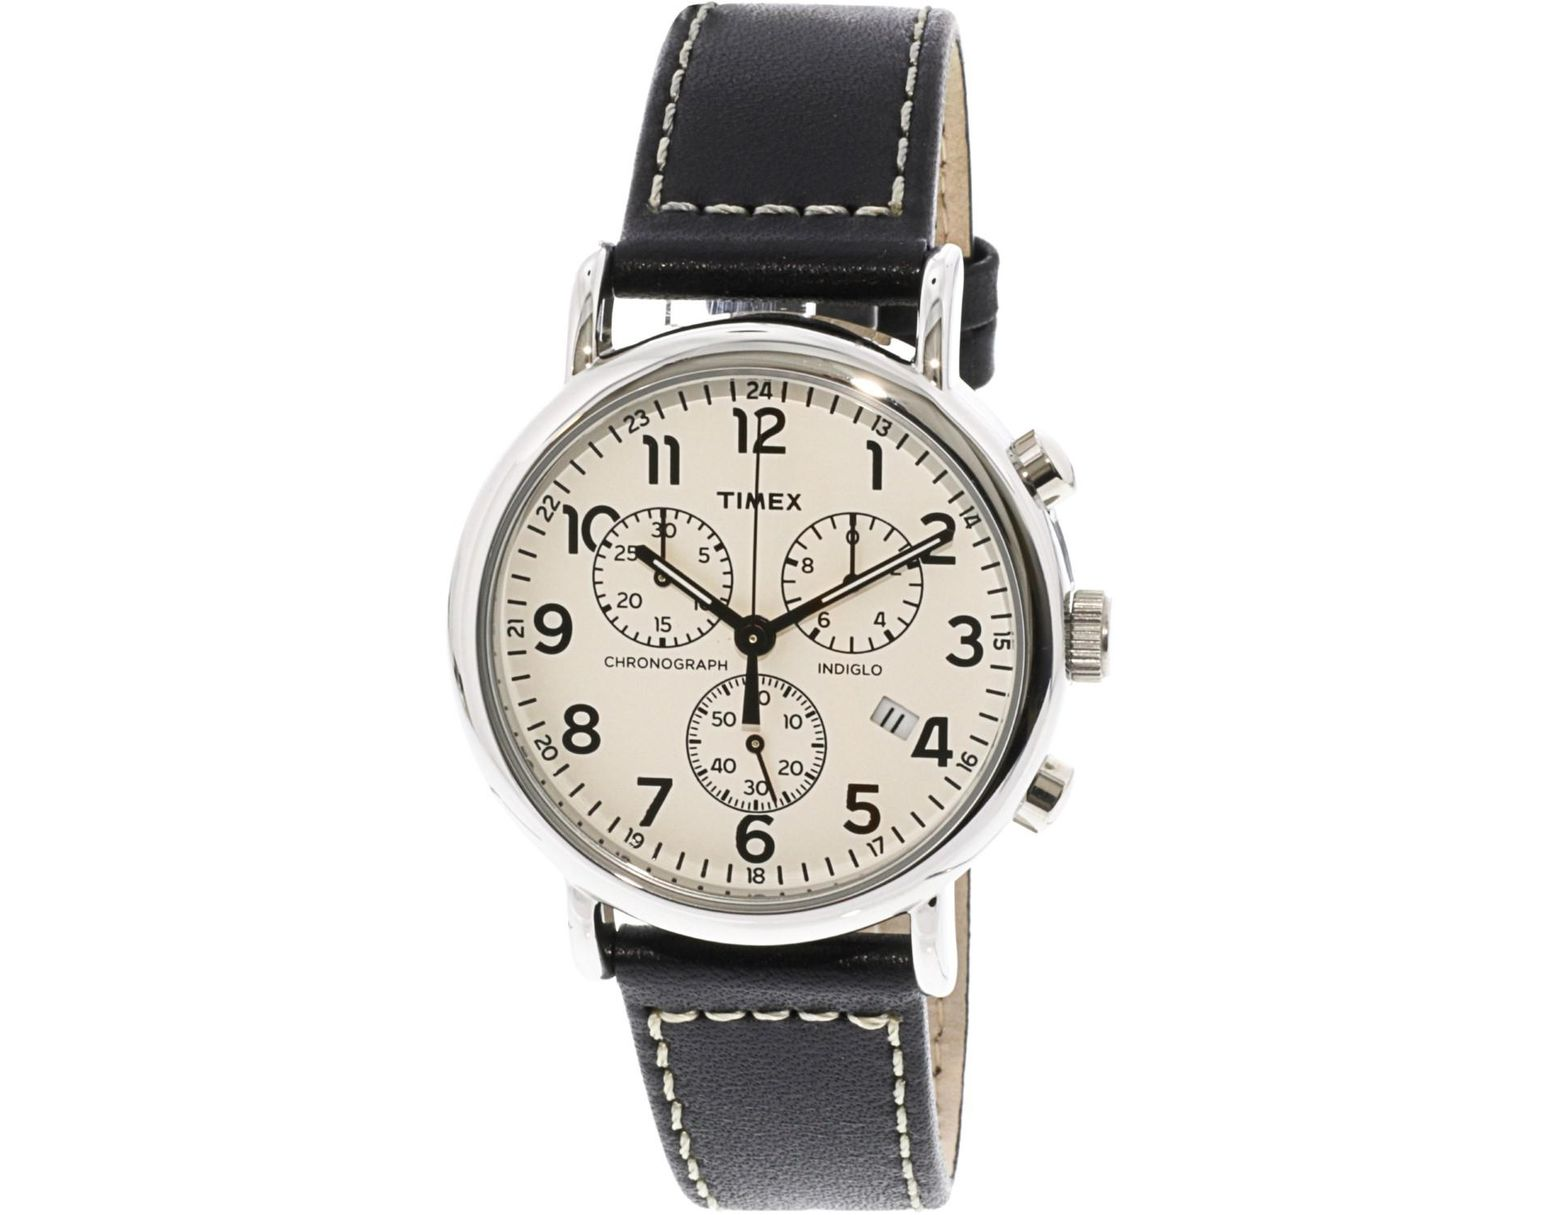 fbfe44f7e Lyst - Timex Weekender Tw2r42800 Leather Analog Quartz Fashion Watch in  Metallic for Men - Save 2%